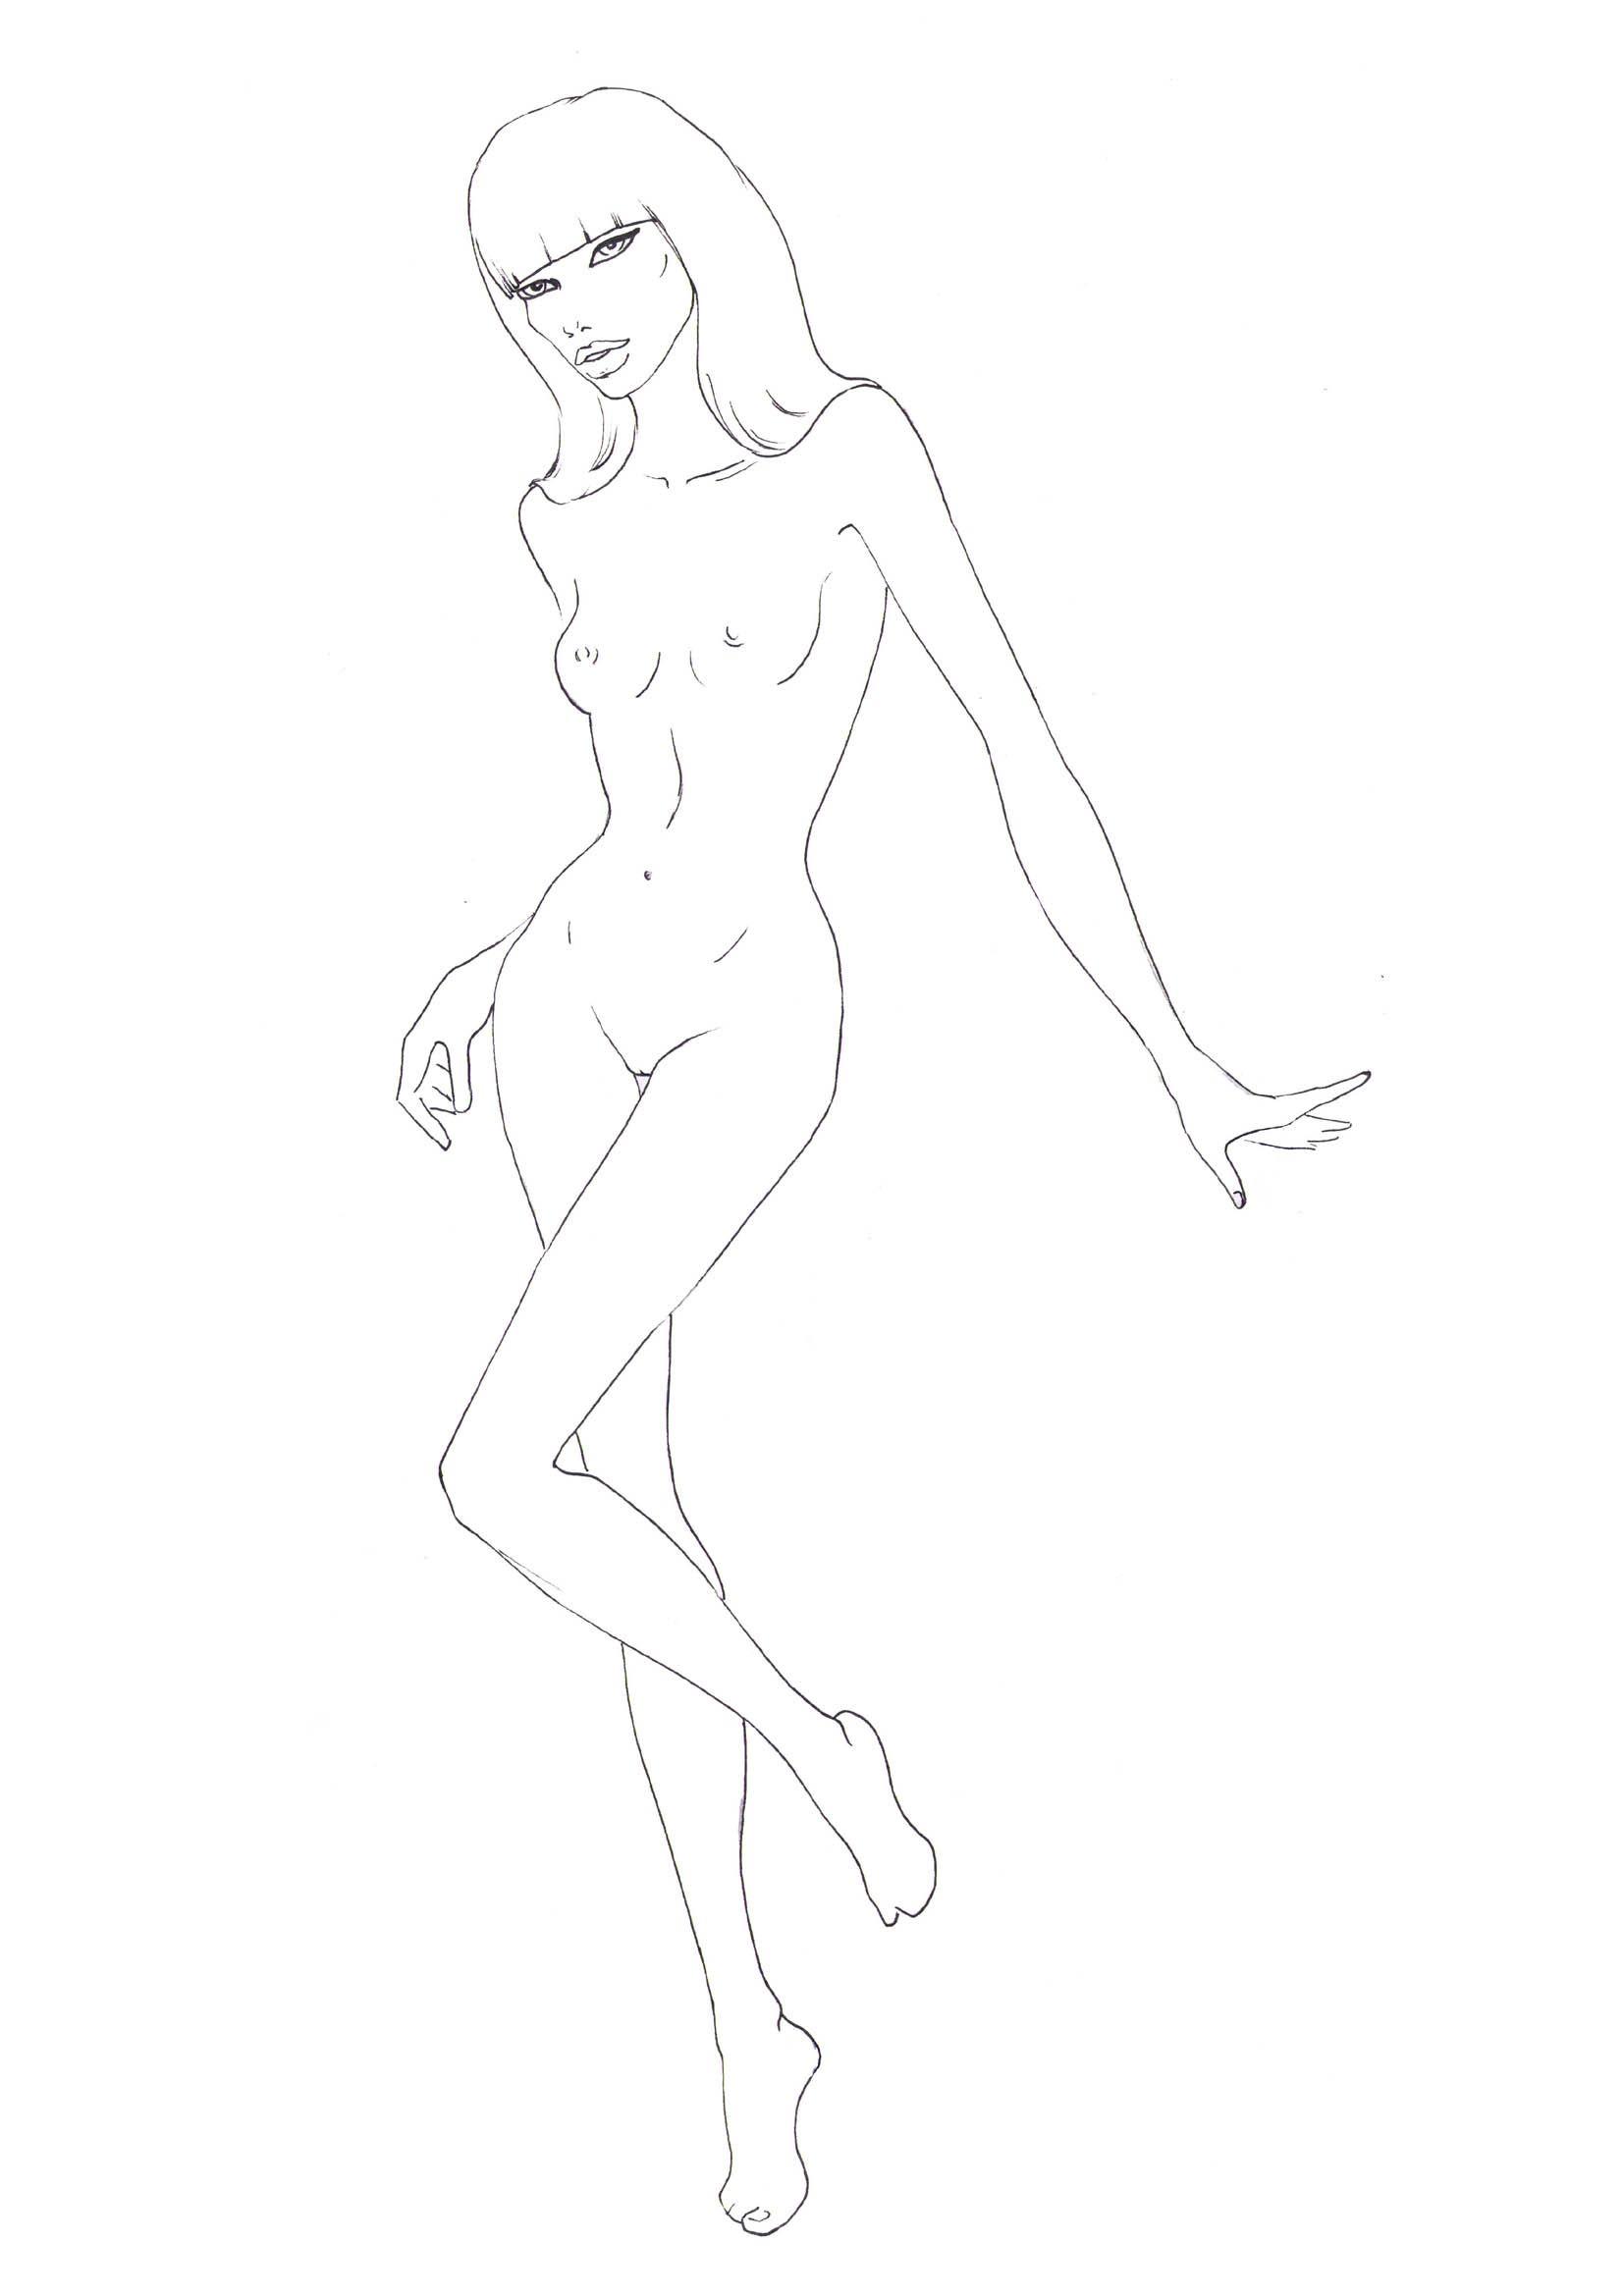 Pin de Mario Freire en designmoda   Pinterest   Figurin, Bocetos y ...